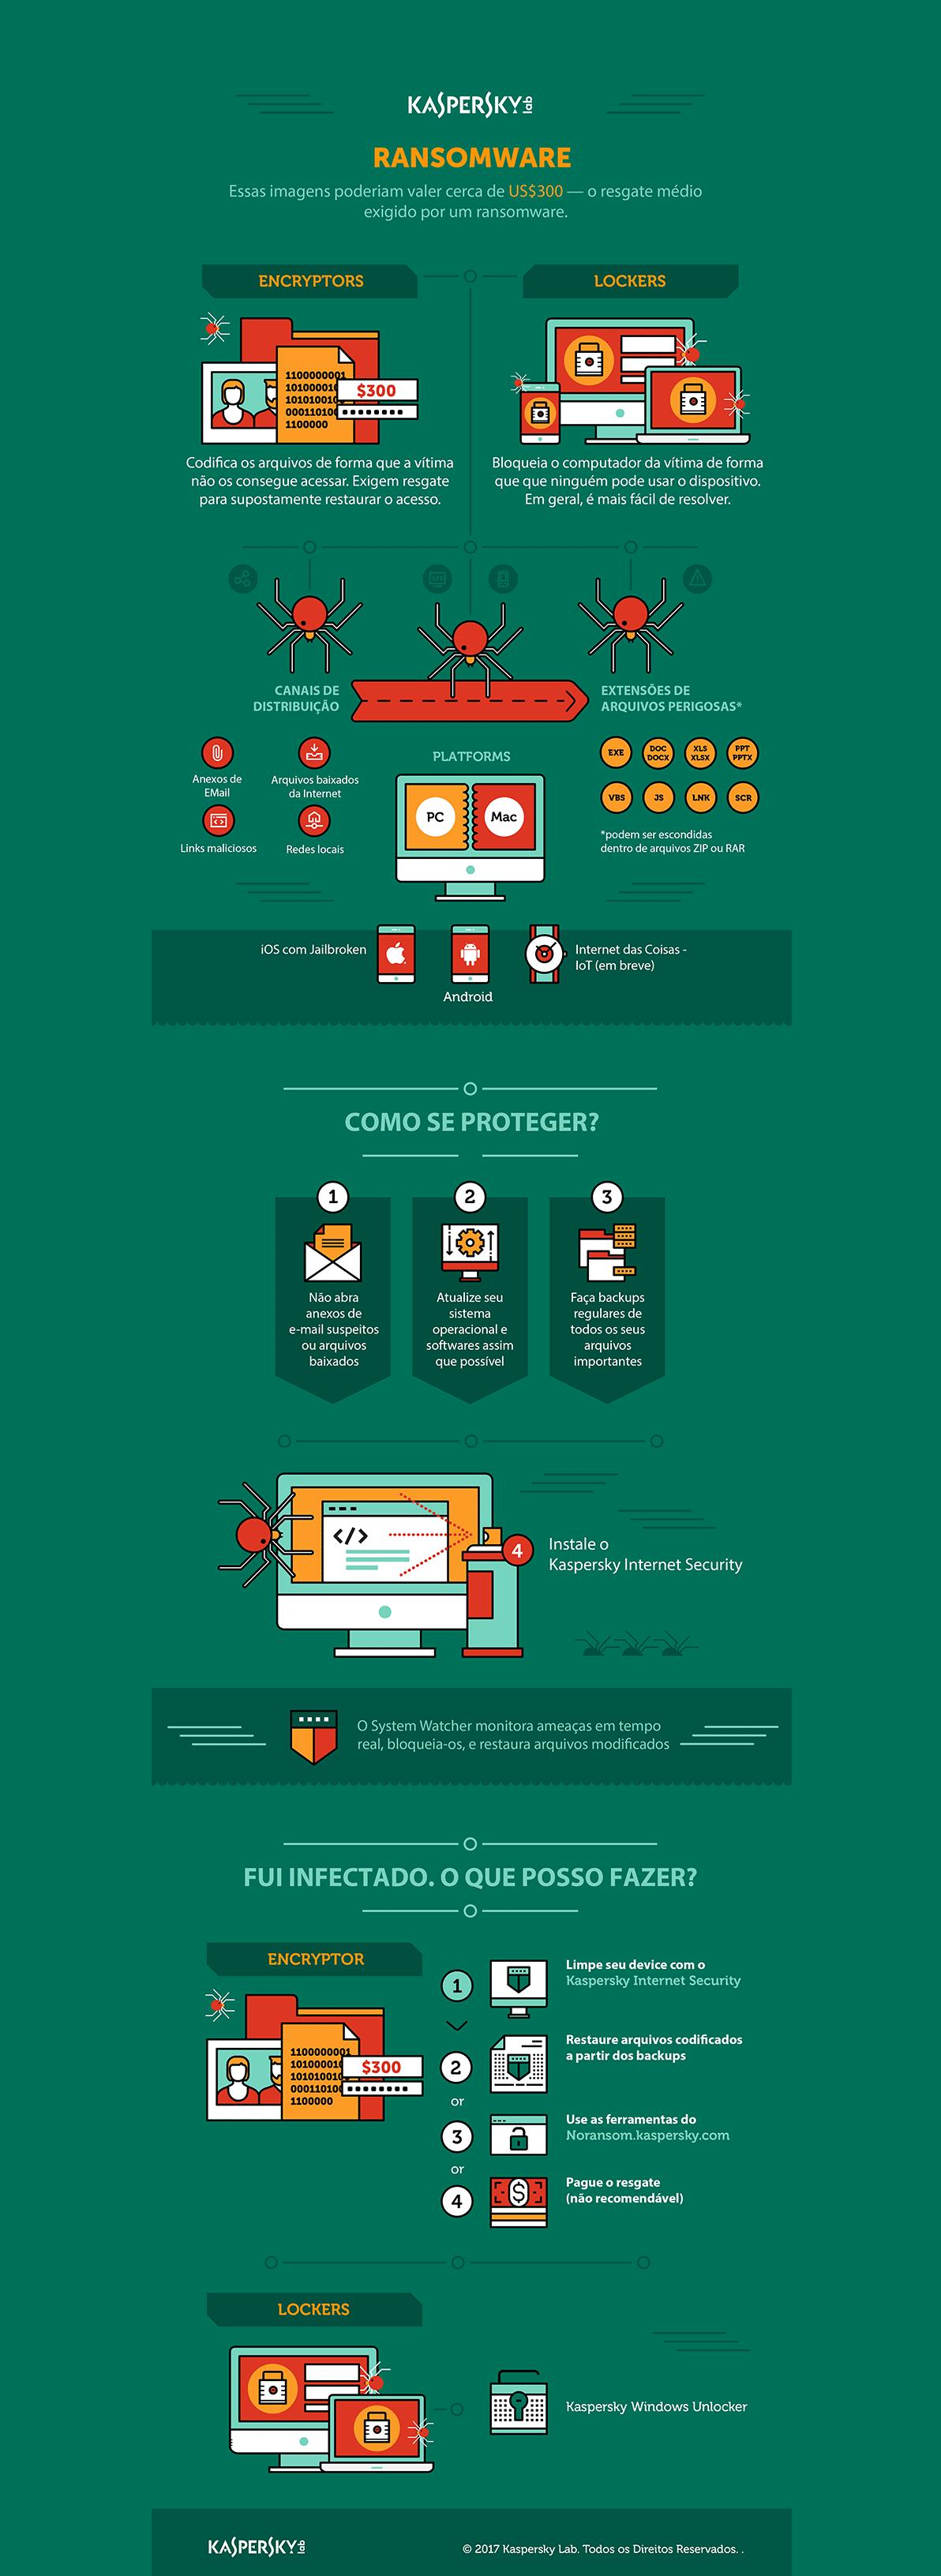 Infográfico sobre ransomware